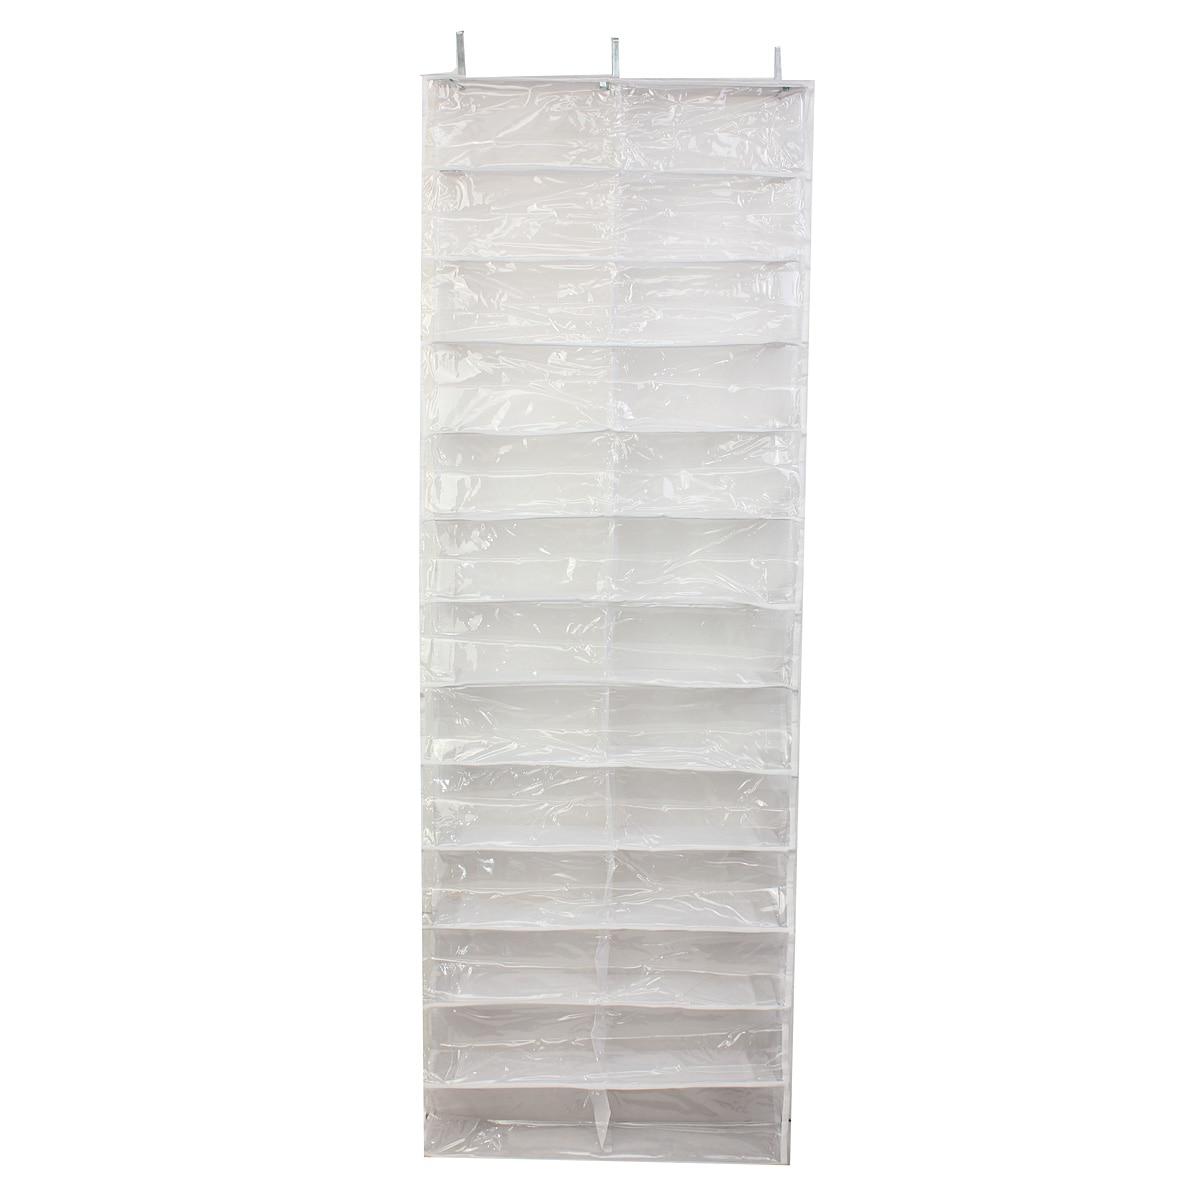 HGHO-26 Pairs Shoe Racks Over Door Hanging Stand Shoe Rack Shelf Storage Organiser Pocket Holder Shoe Storage Cabinet